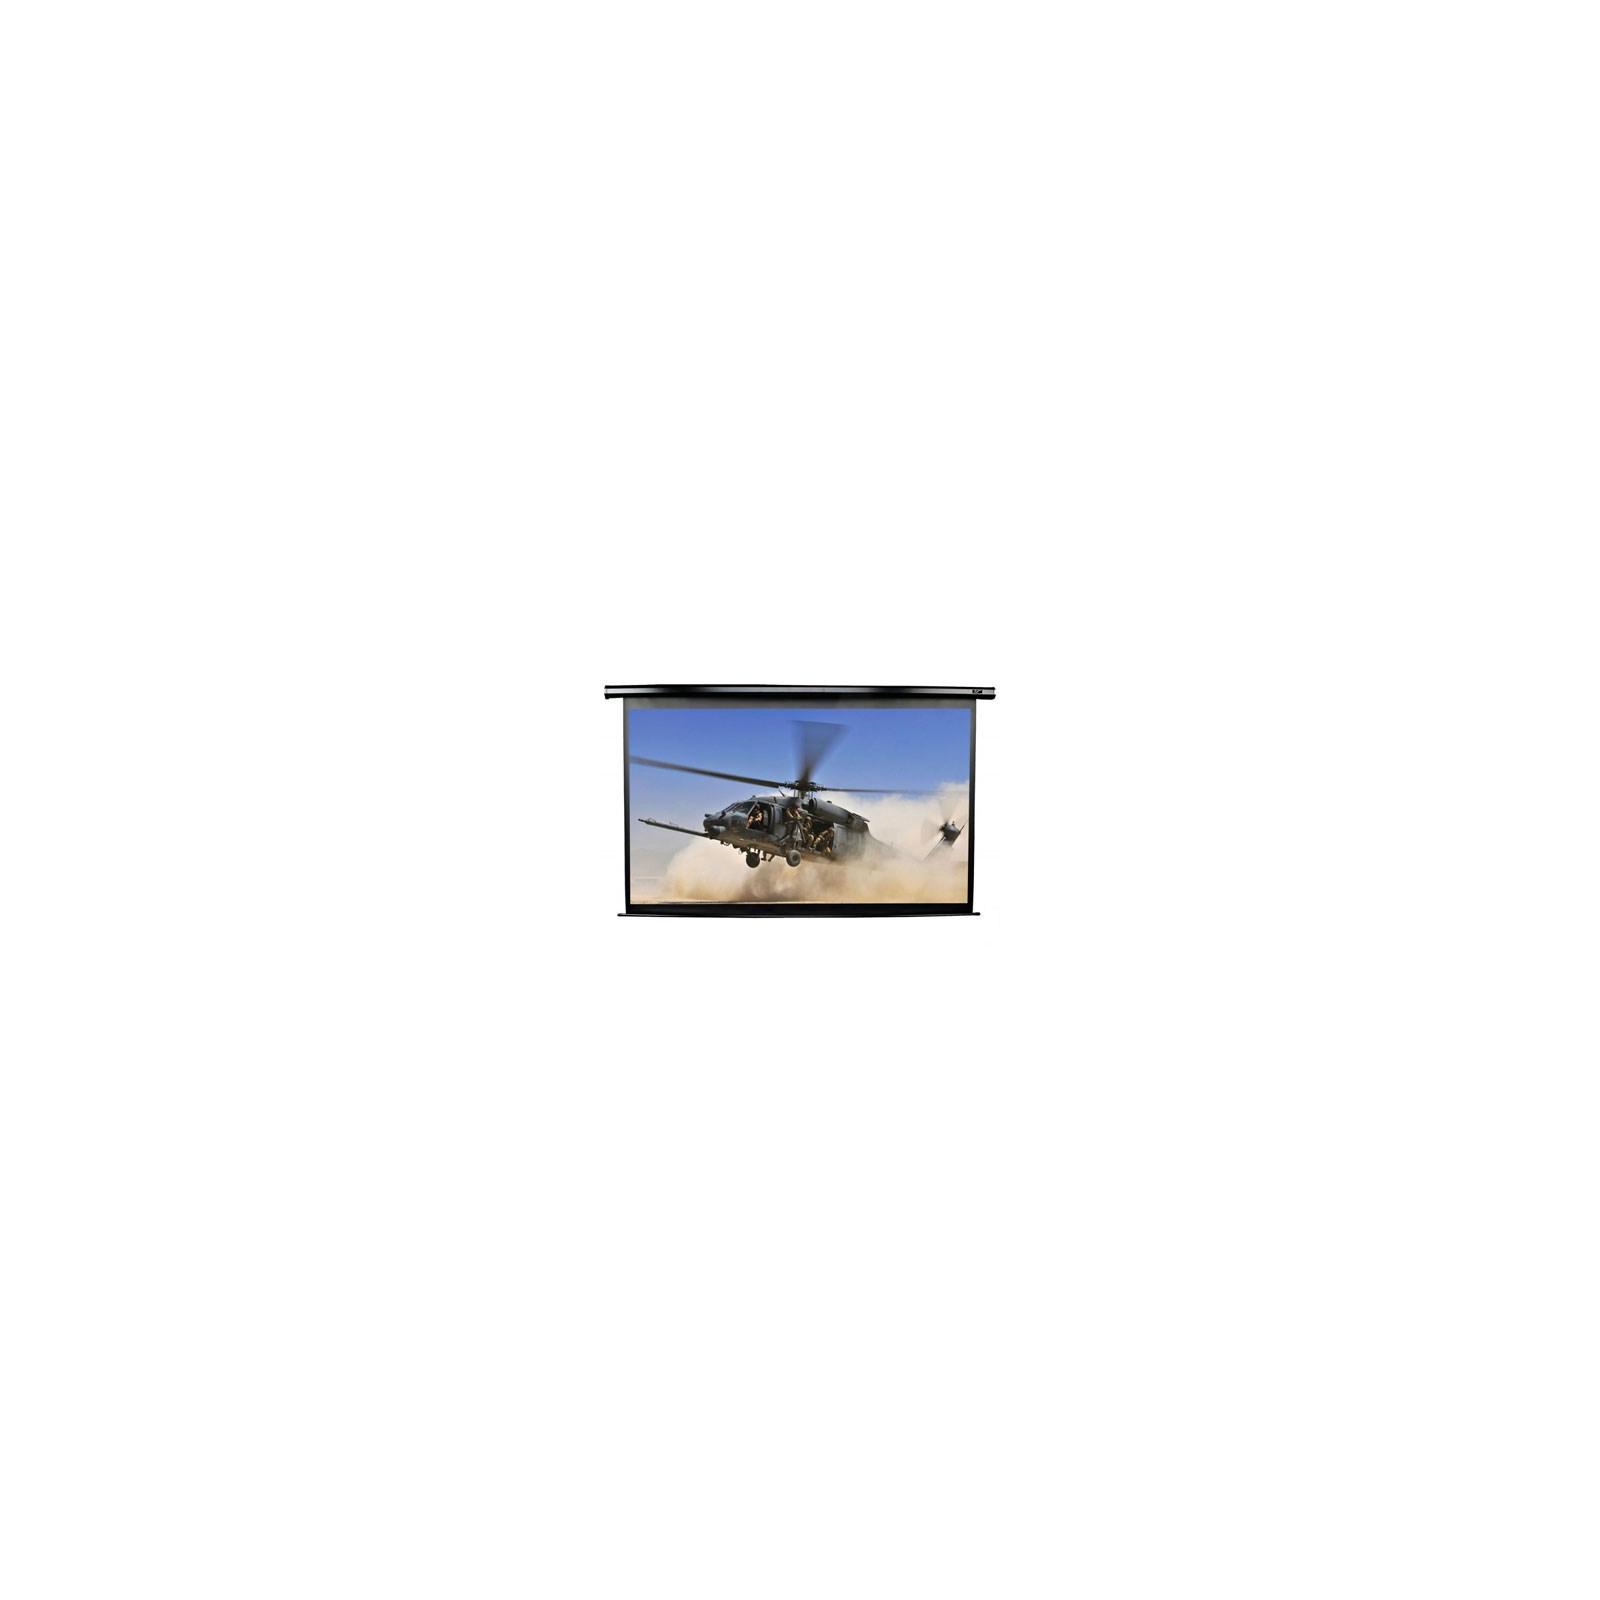 Проекционный экран VMAX135UWH2-E24 ELITE SCREENS